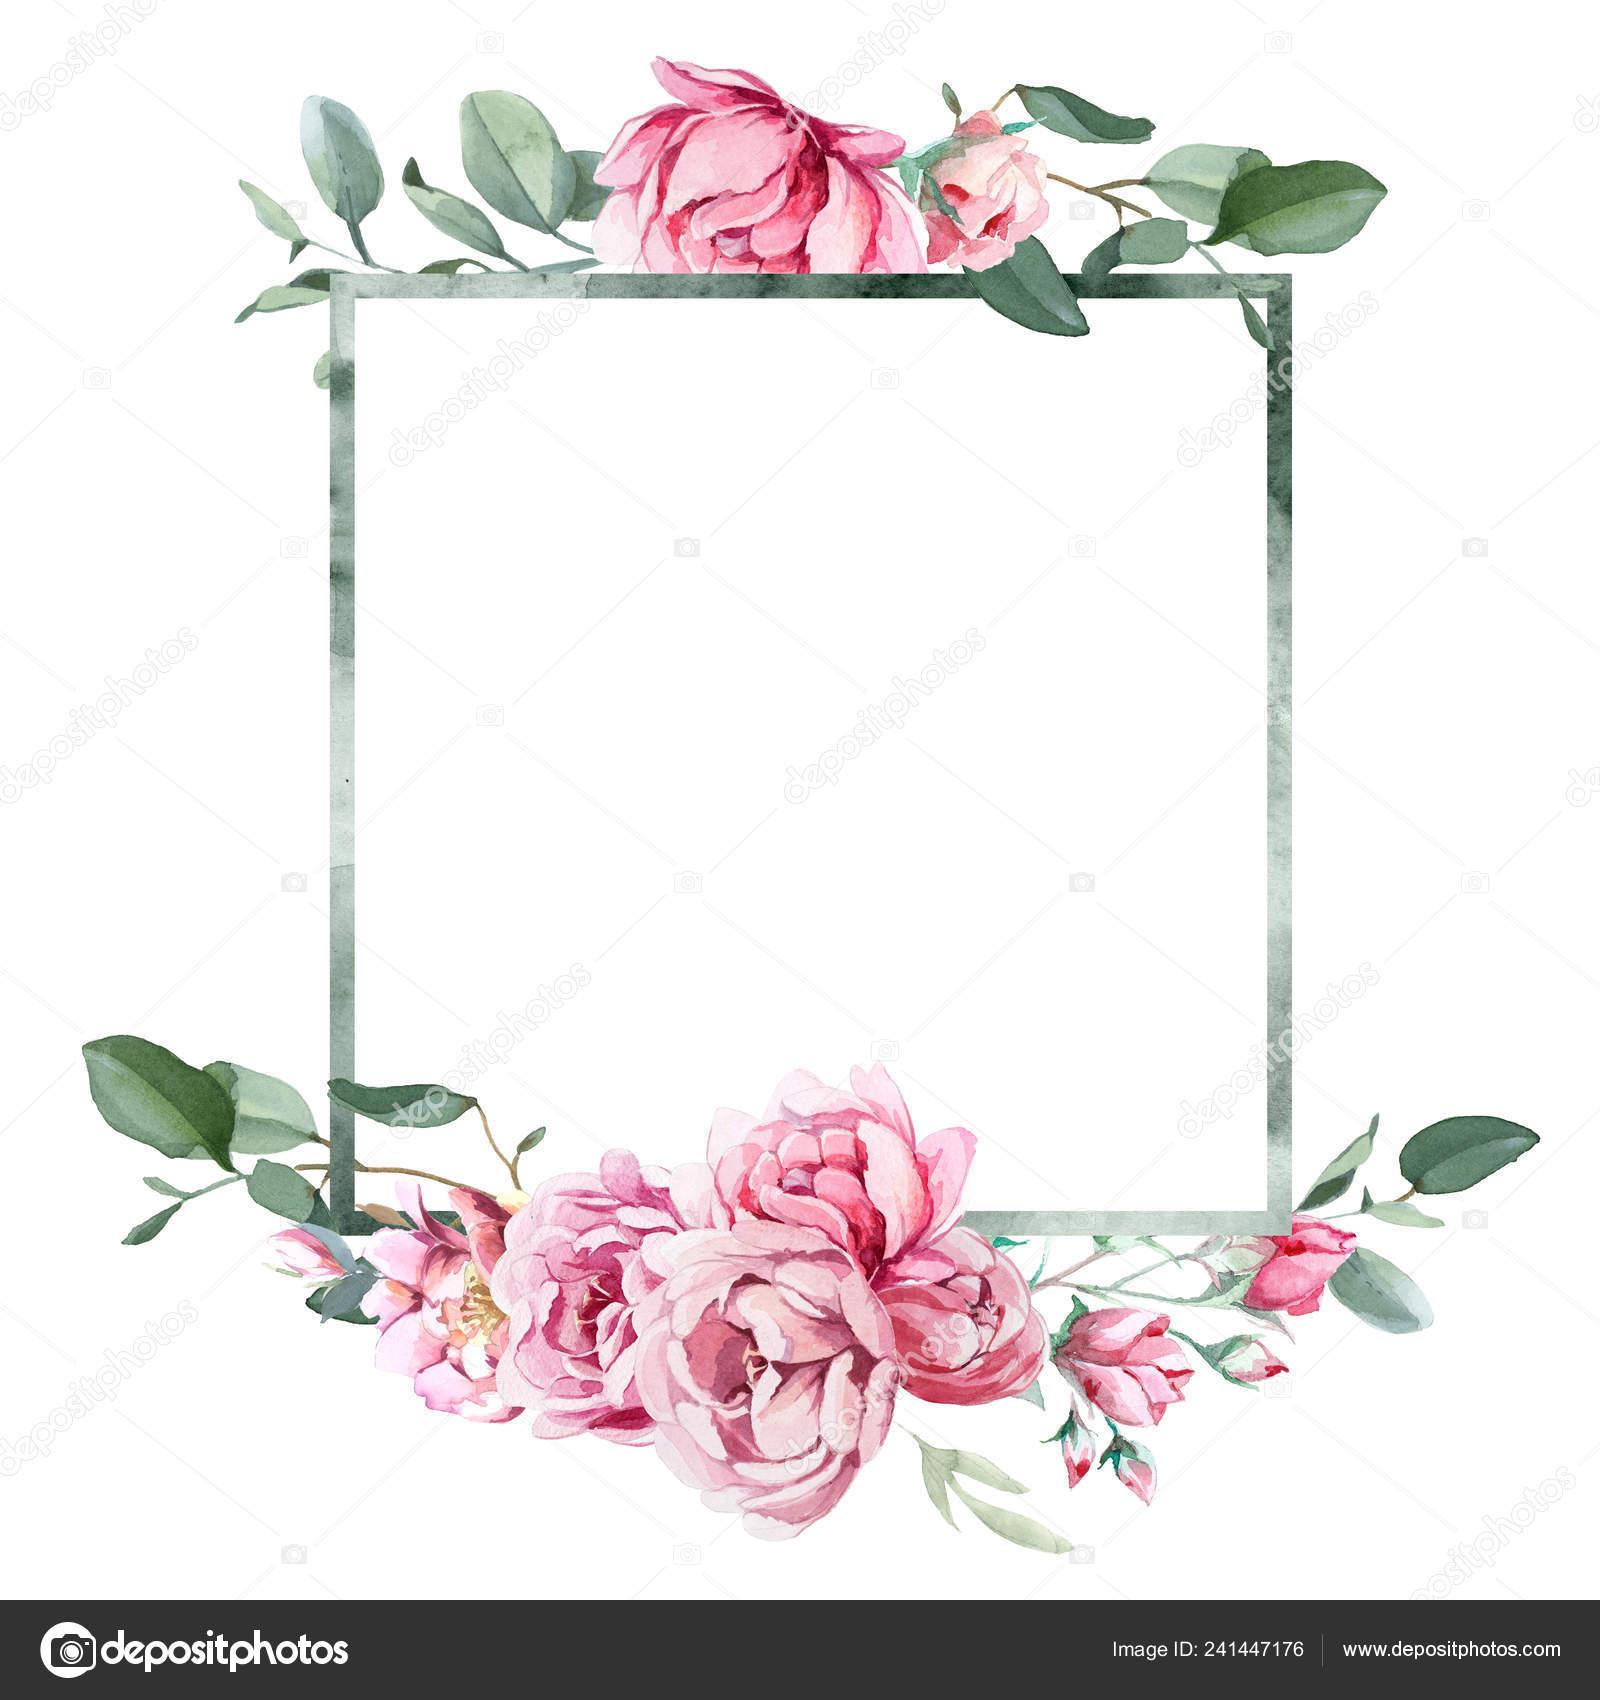 Watercolor Illustration Light Pink Flowers Green Leaves Frame